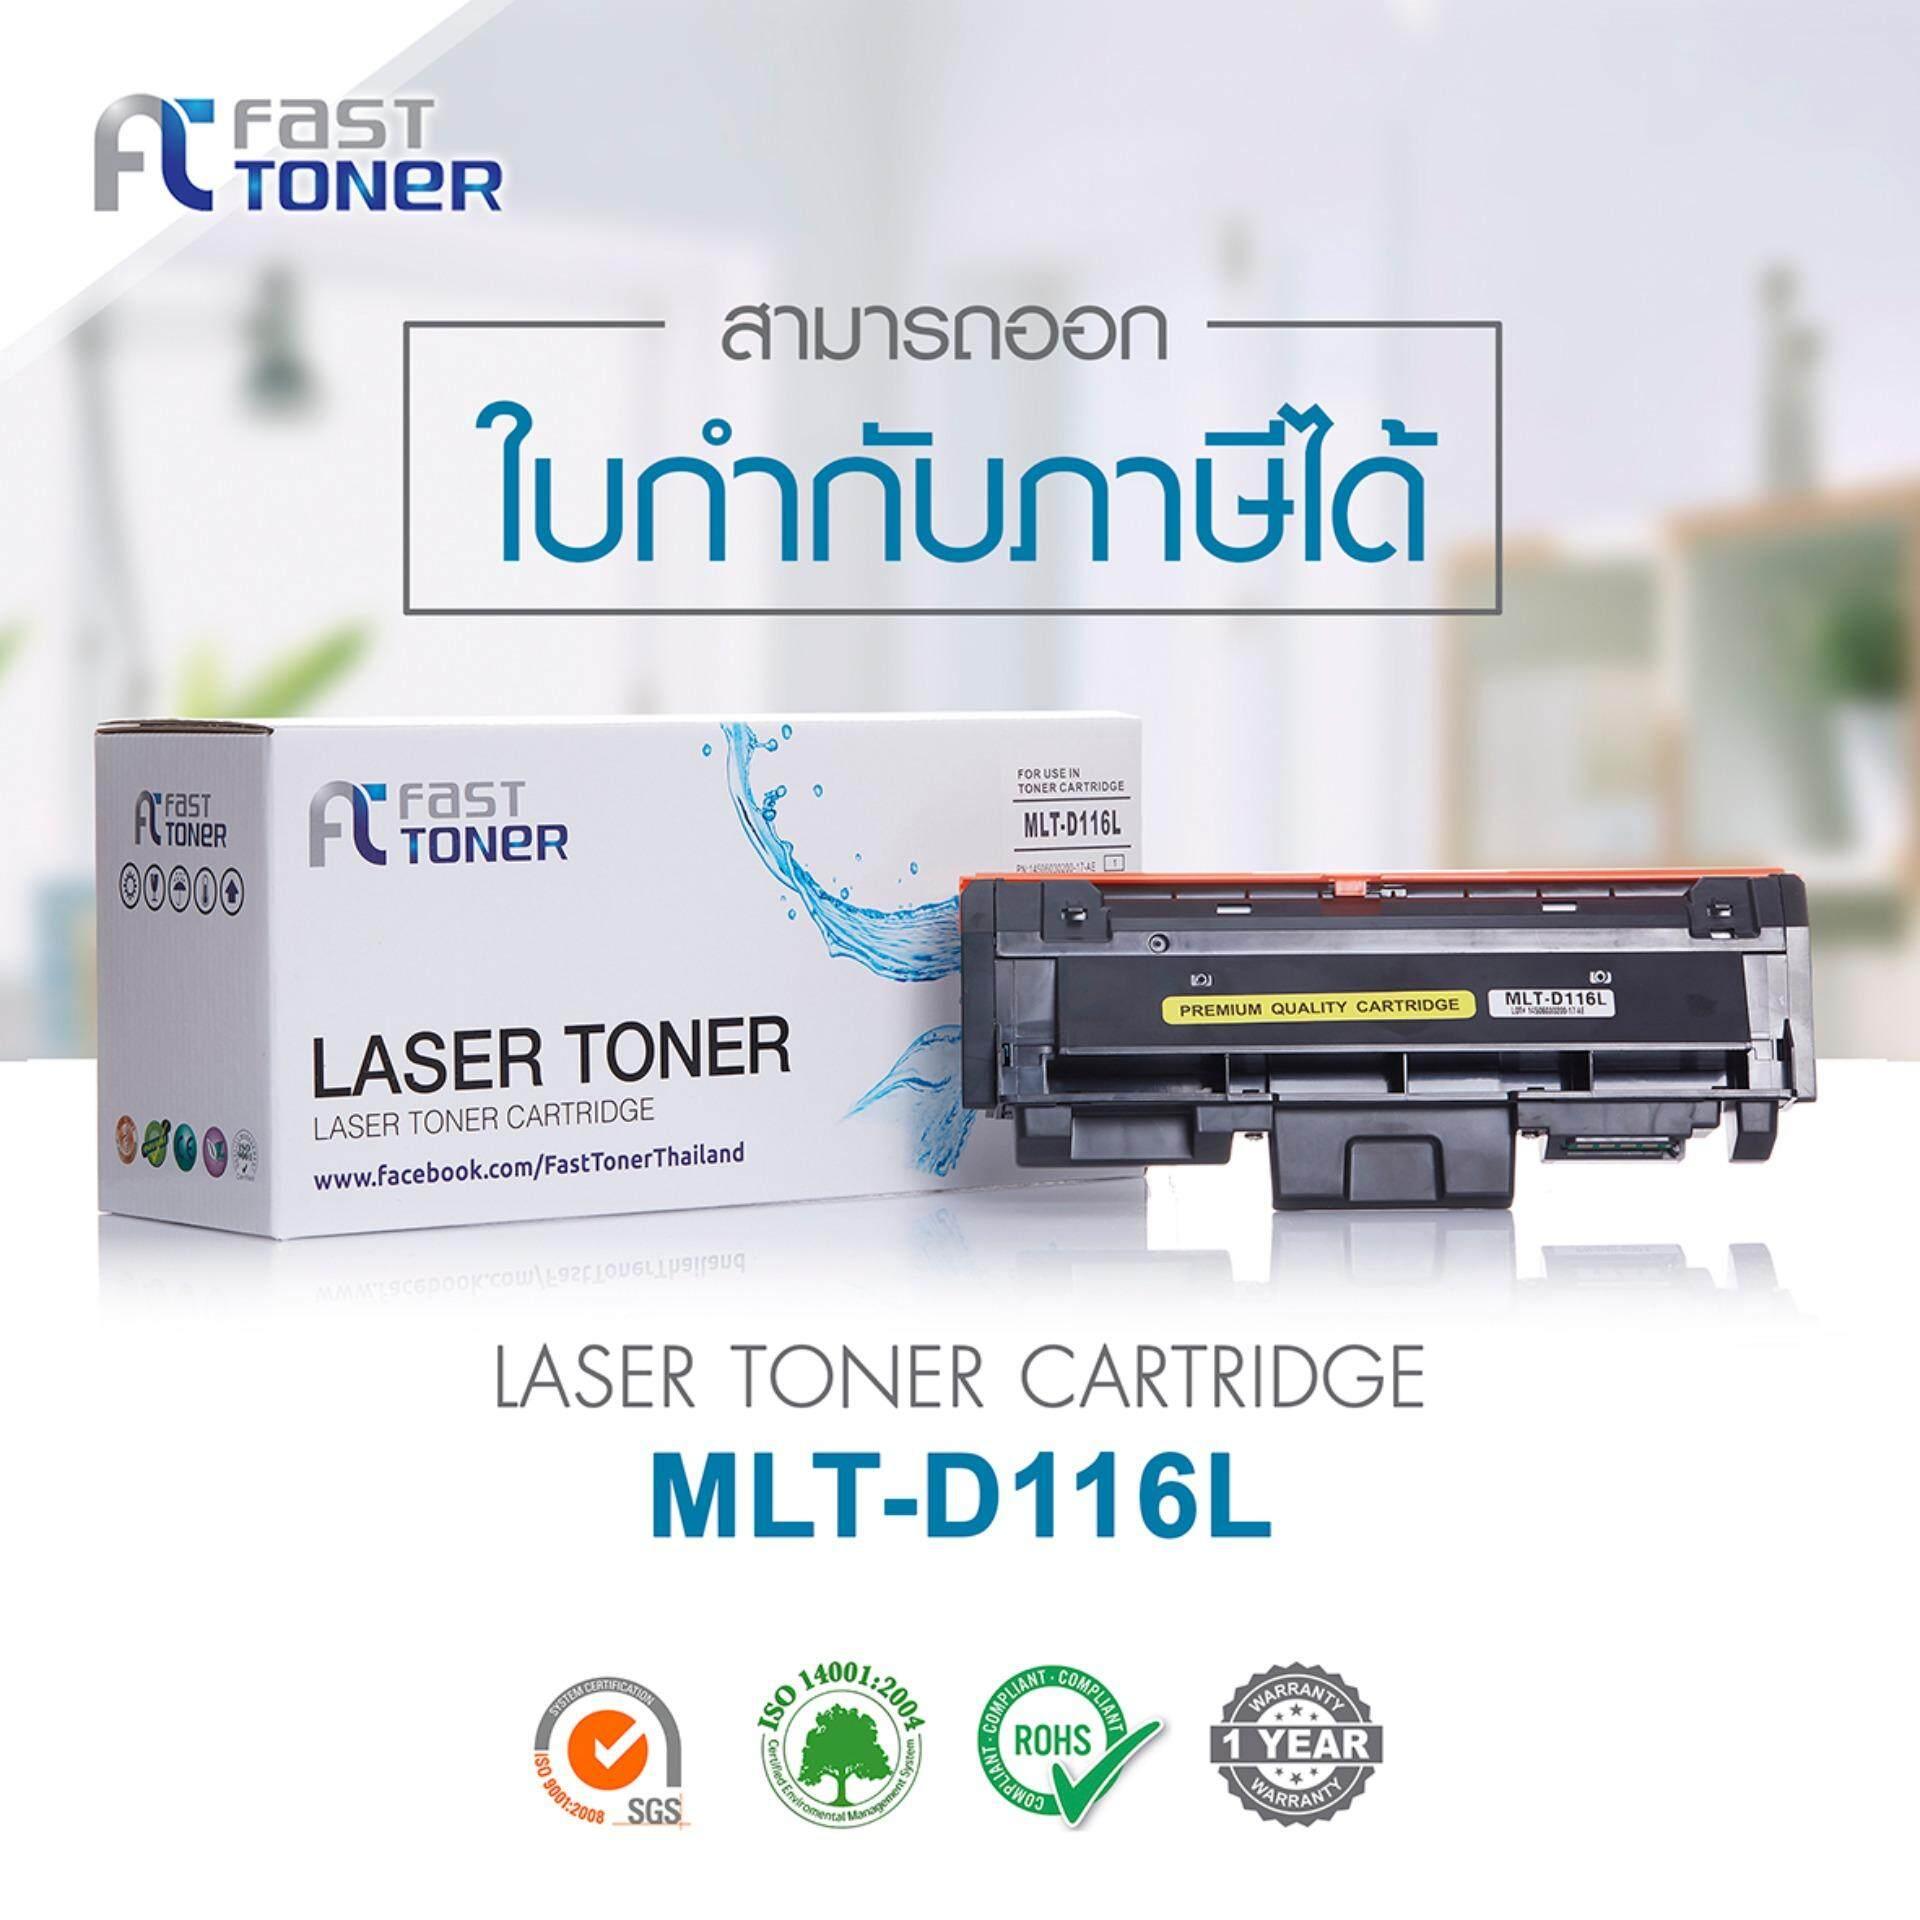 Fast Toner ตลับหมึก เทียบเท่า Laser Toner Samsung MLT-D116L